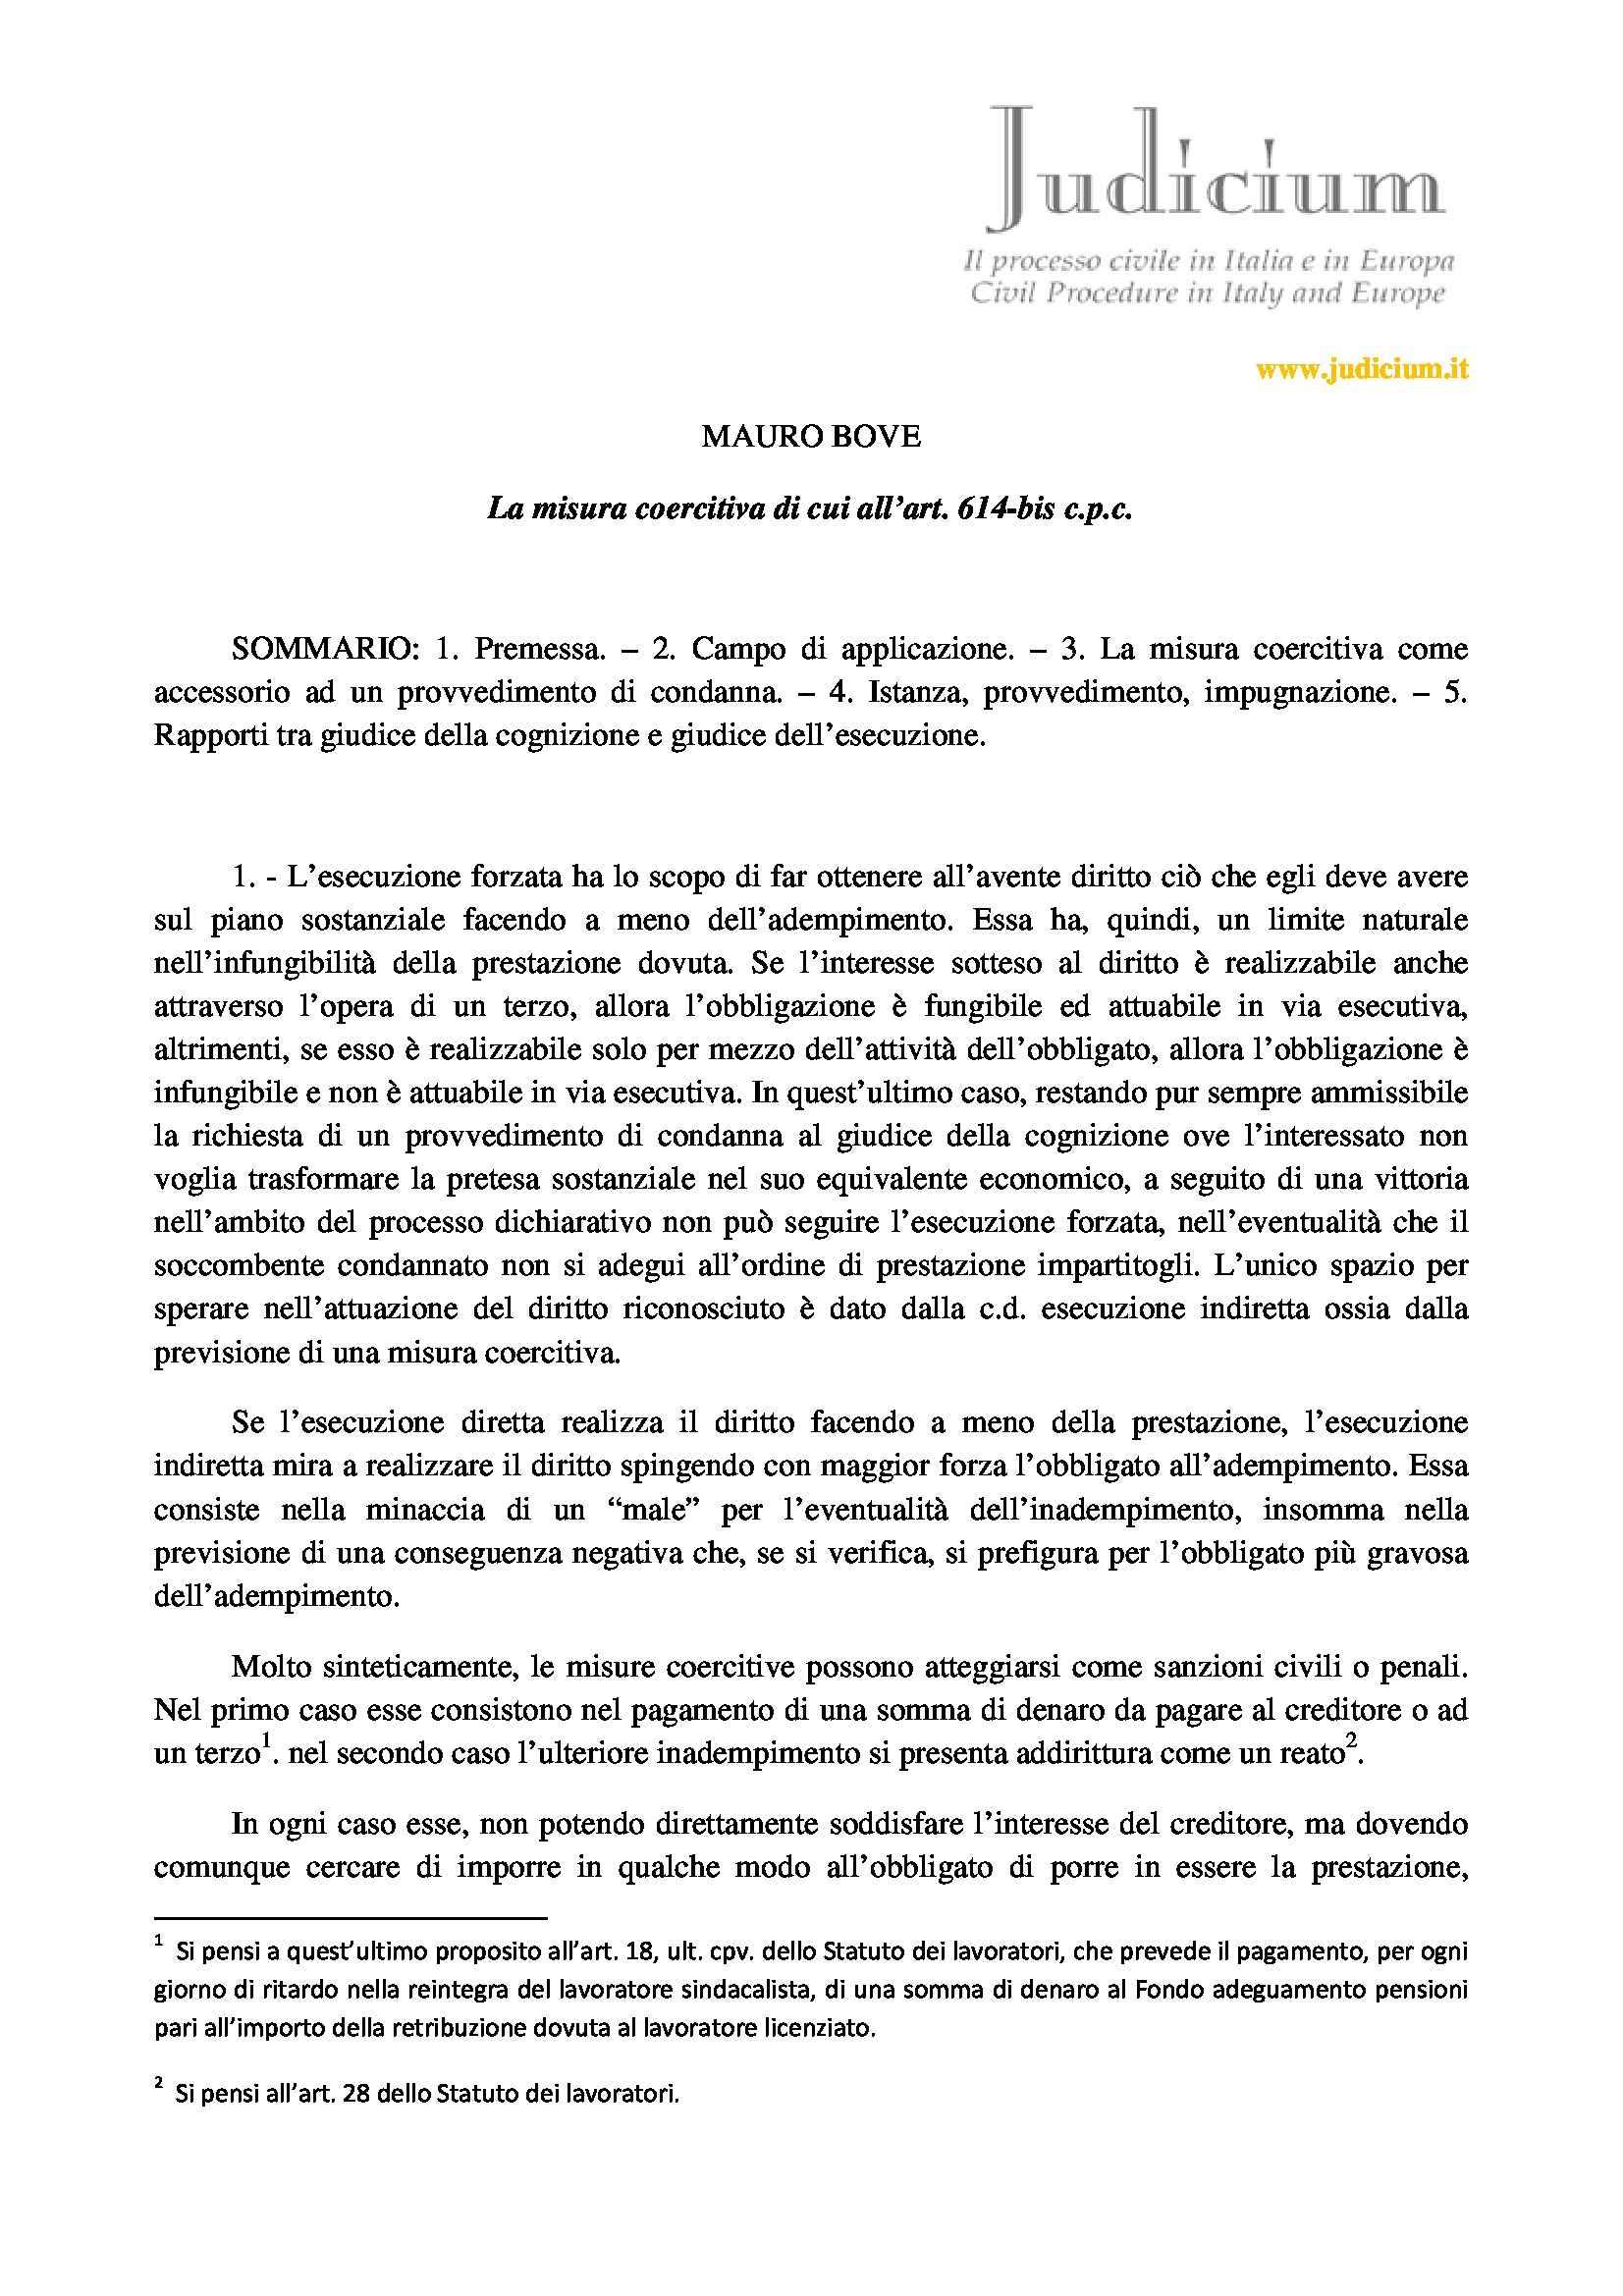 Esecuzione forzata - Art. 614 bis cpc